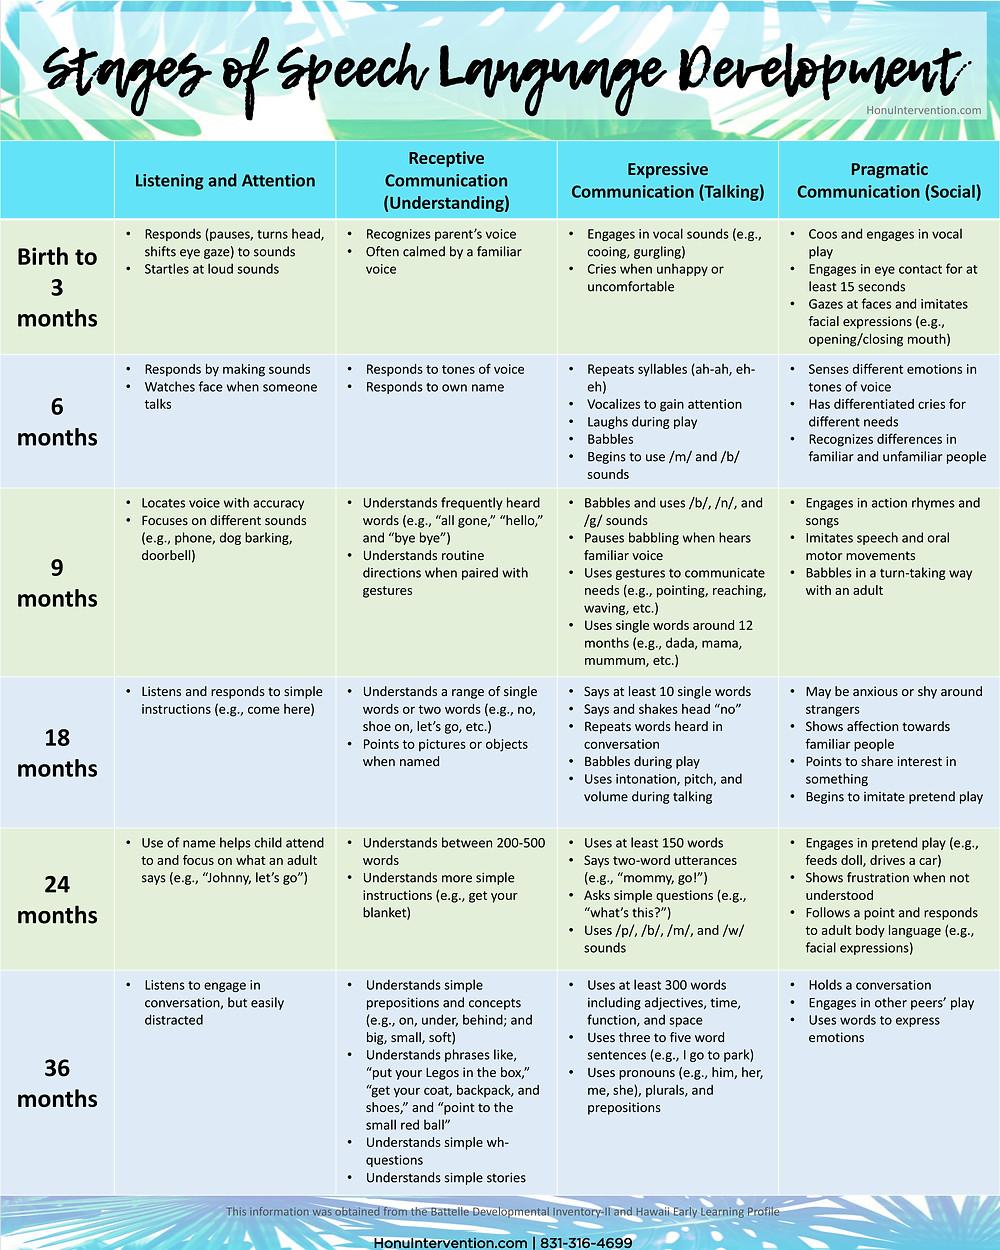 Stages of speech language development